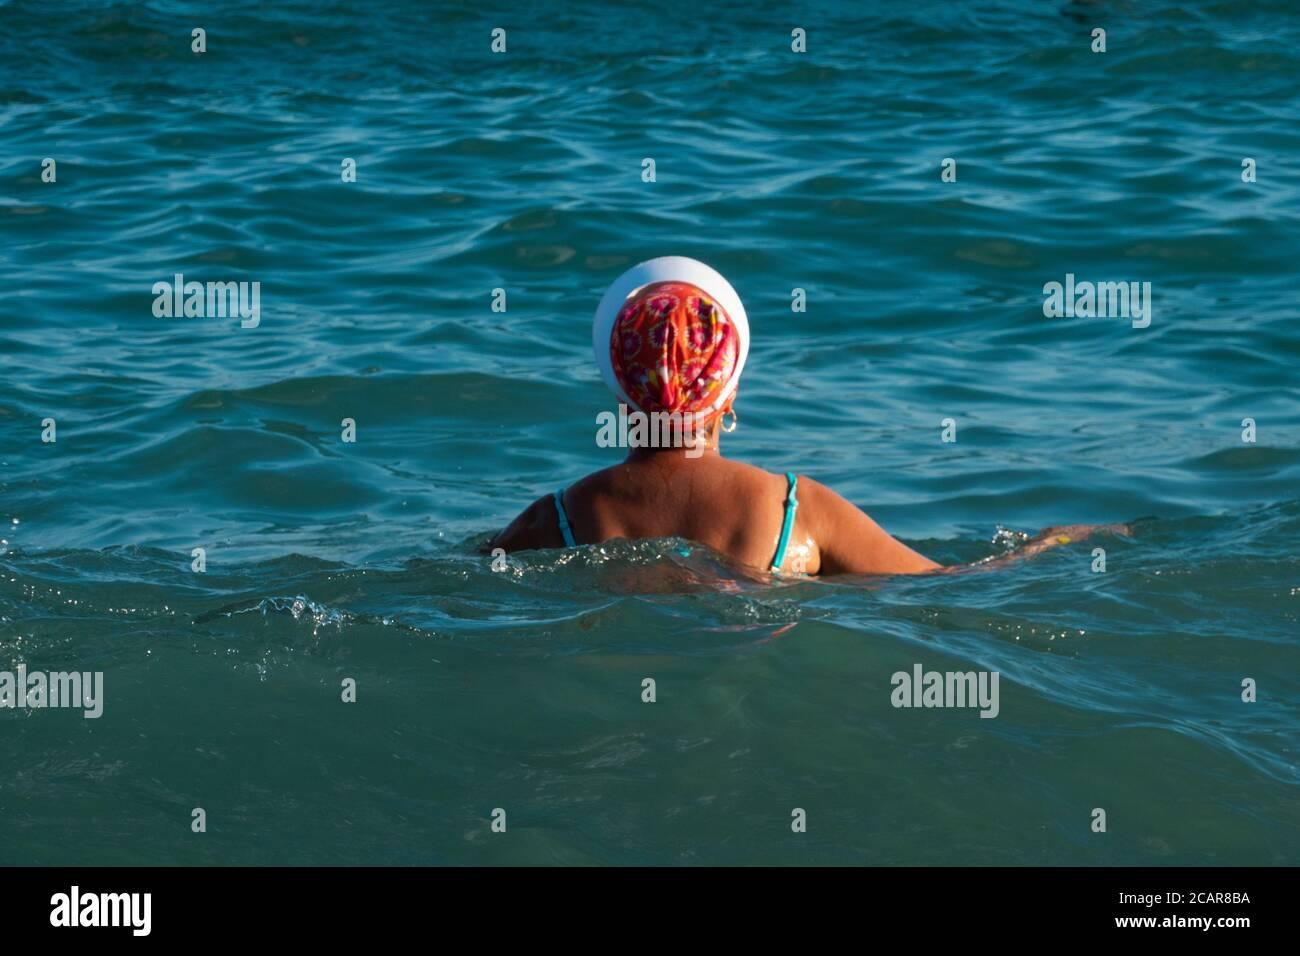 People On A Resort Of Krasnodar Krai Shirokaya Balka Beach Stock Photo Alamy